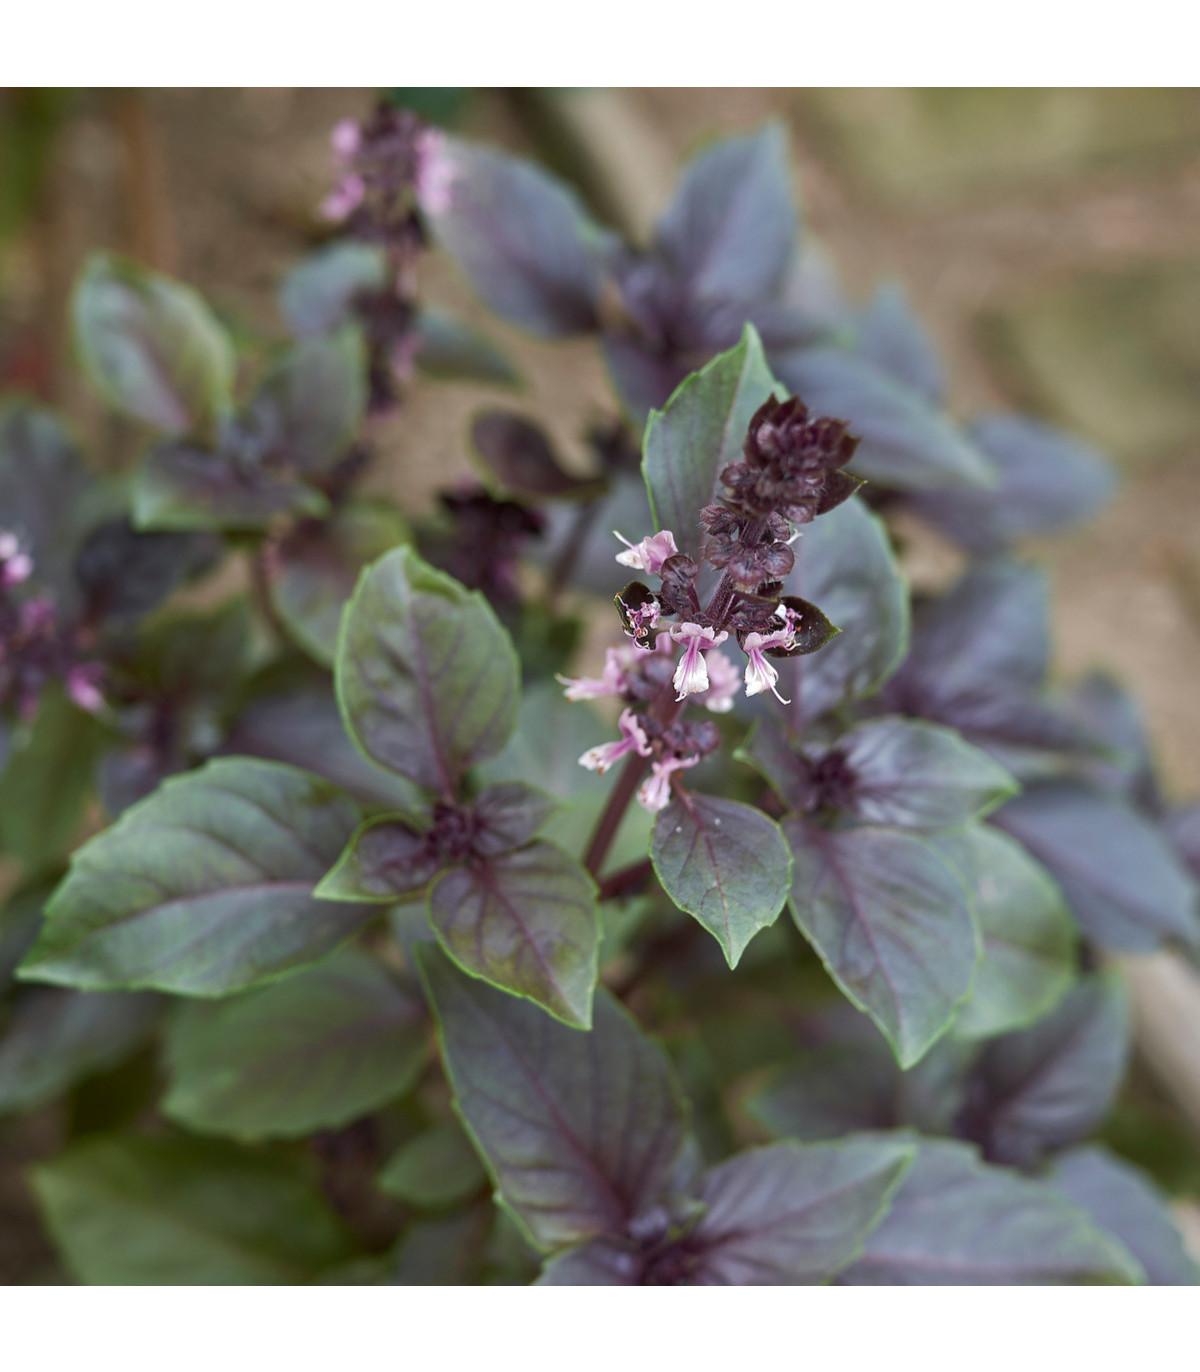 Bazalka skořicová - osivo Bazalky - Ocimum basilicum - 50 ks